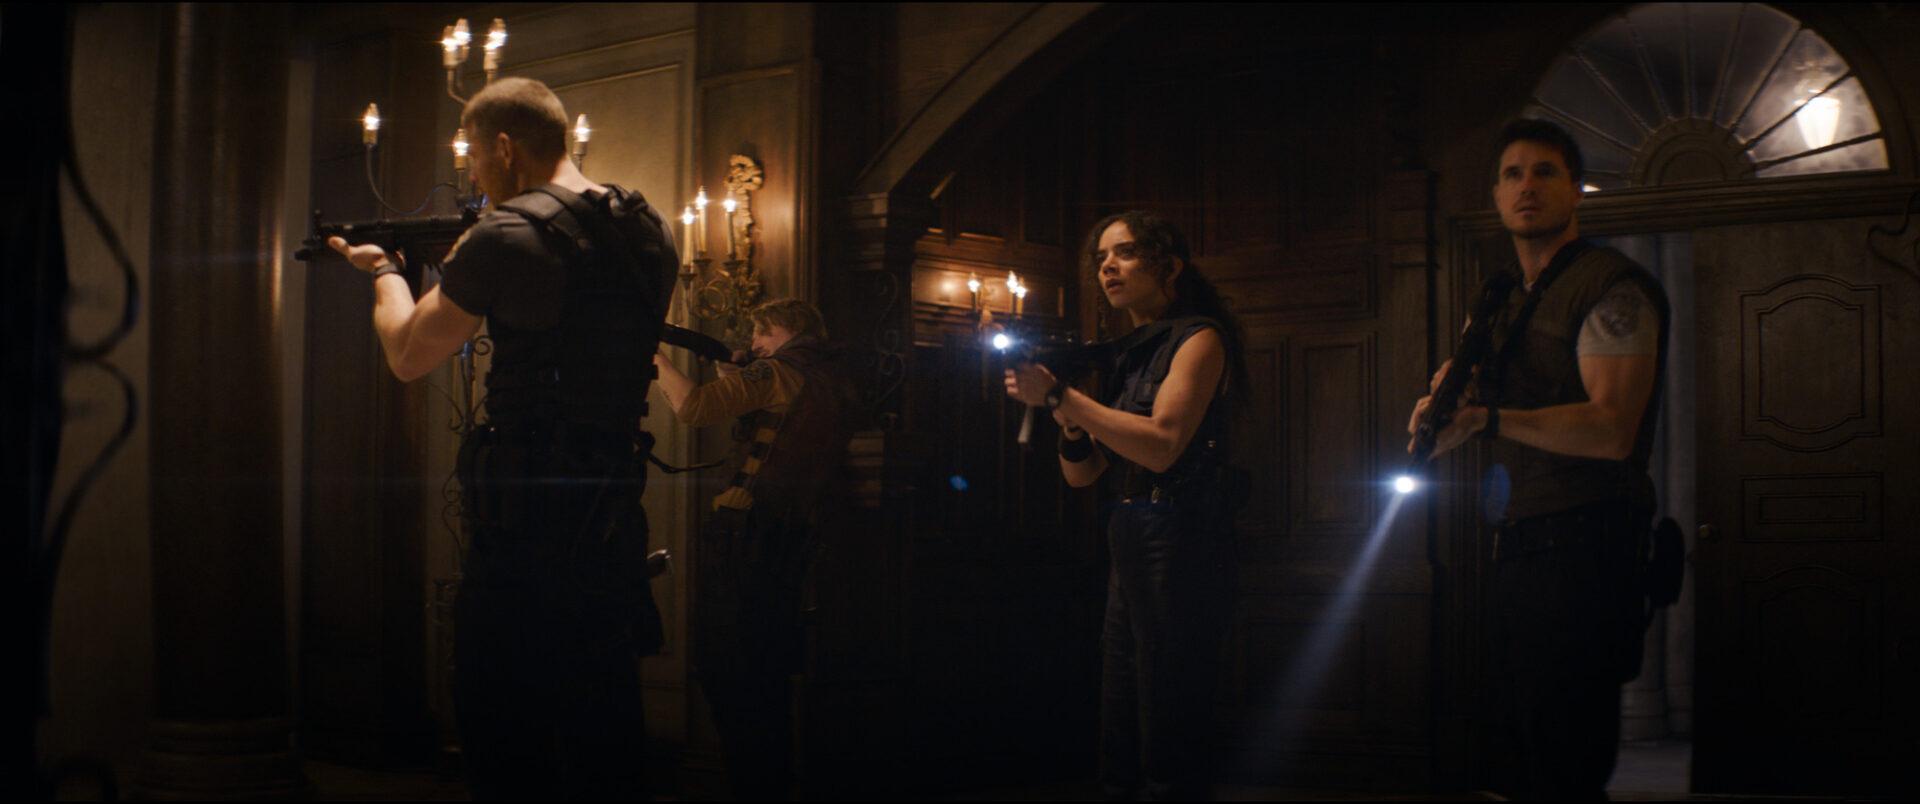 Confira as primeiras imagens de Resident Evil - legadoplus